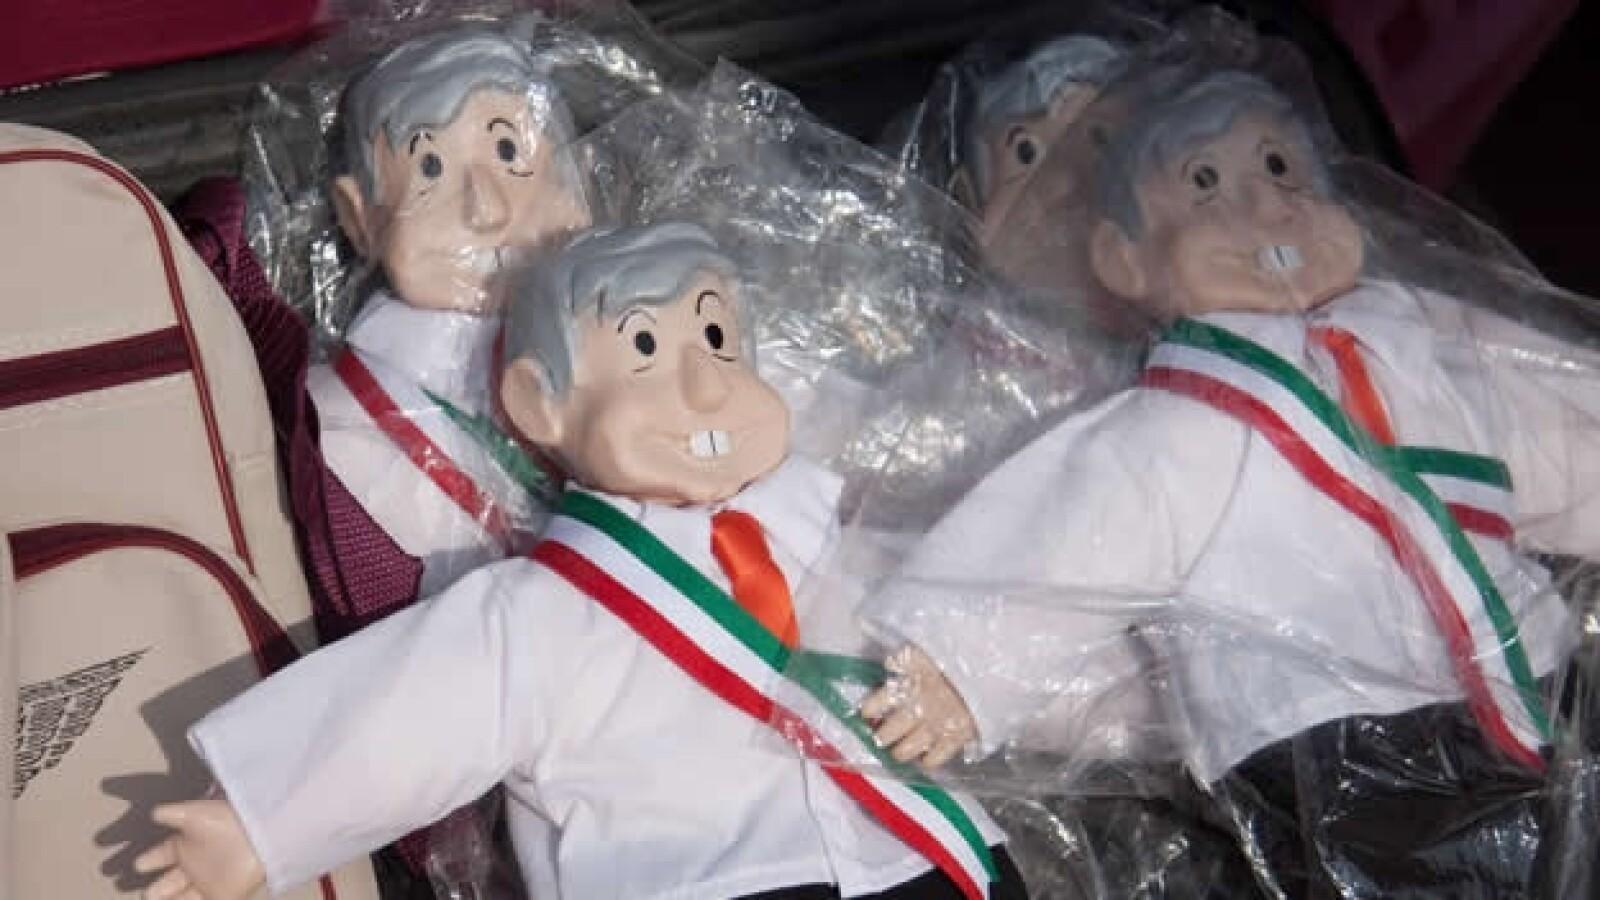 1 de abril-lopez obrador, muñecos en san juan del río querétaro